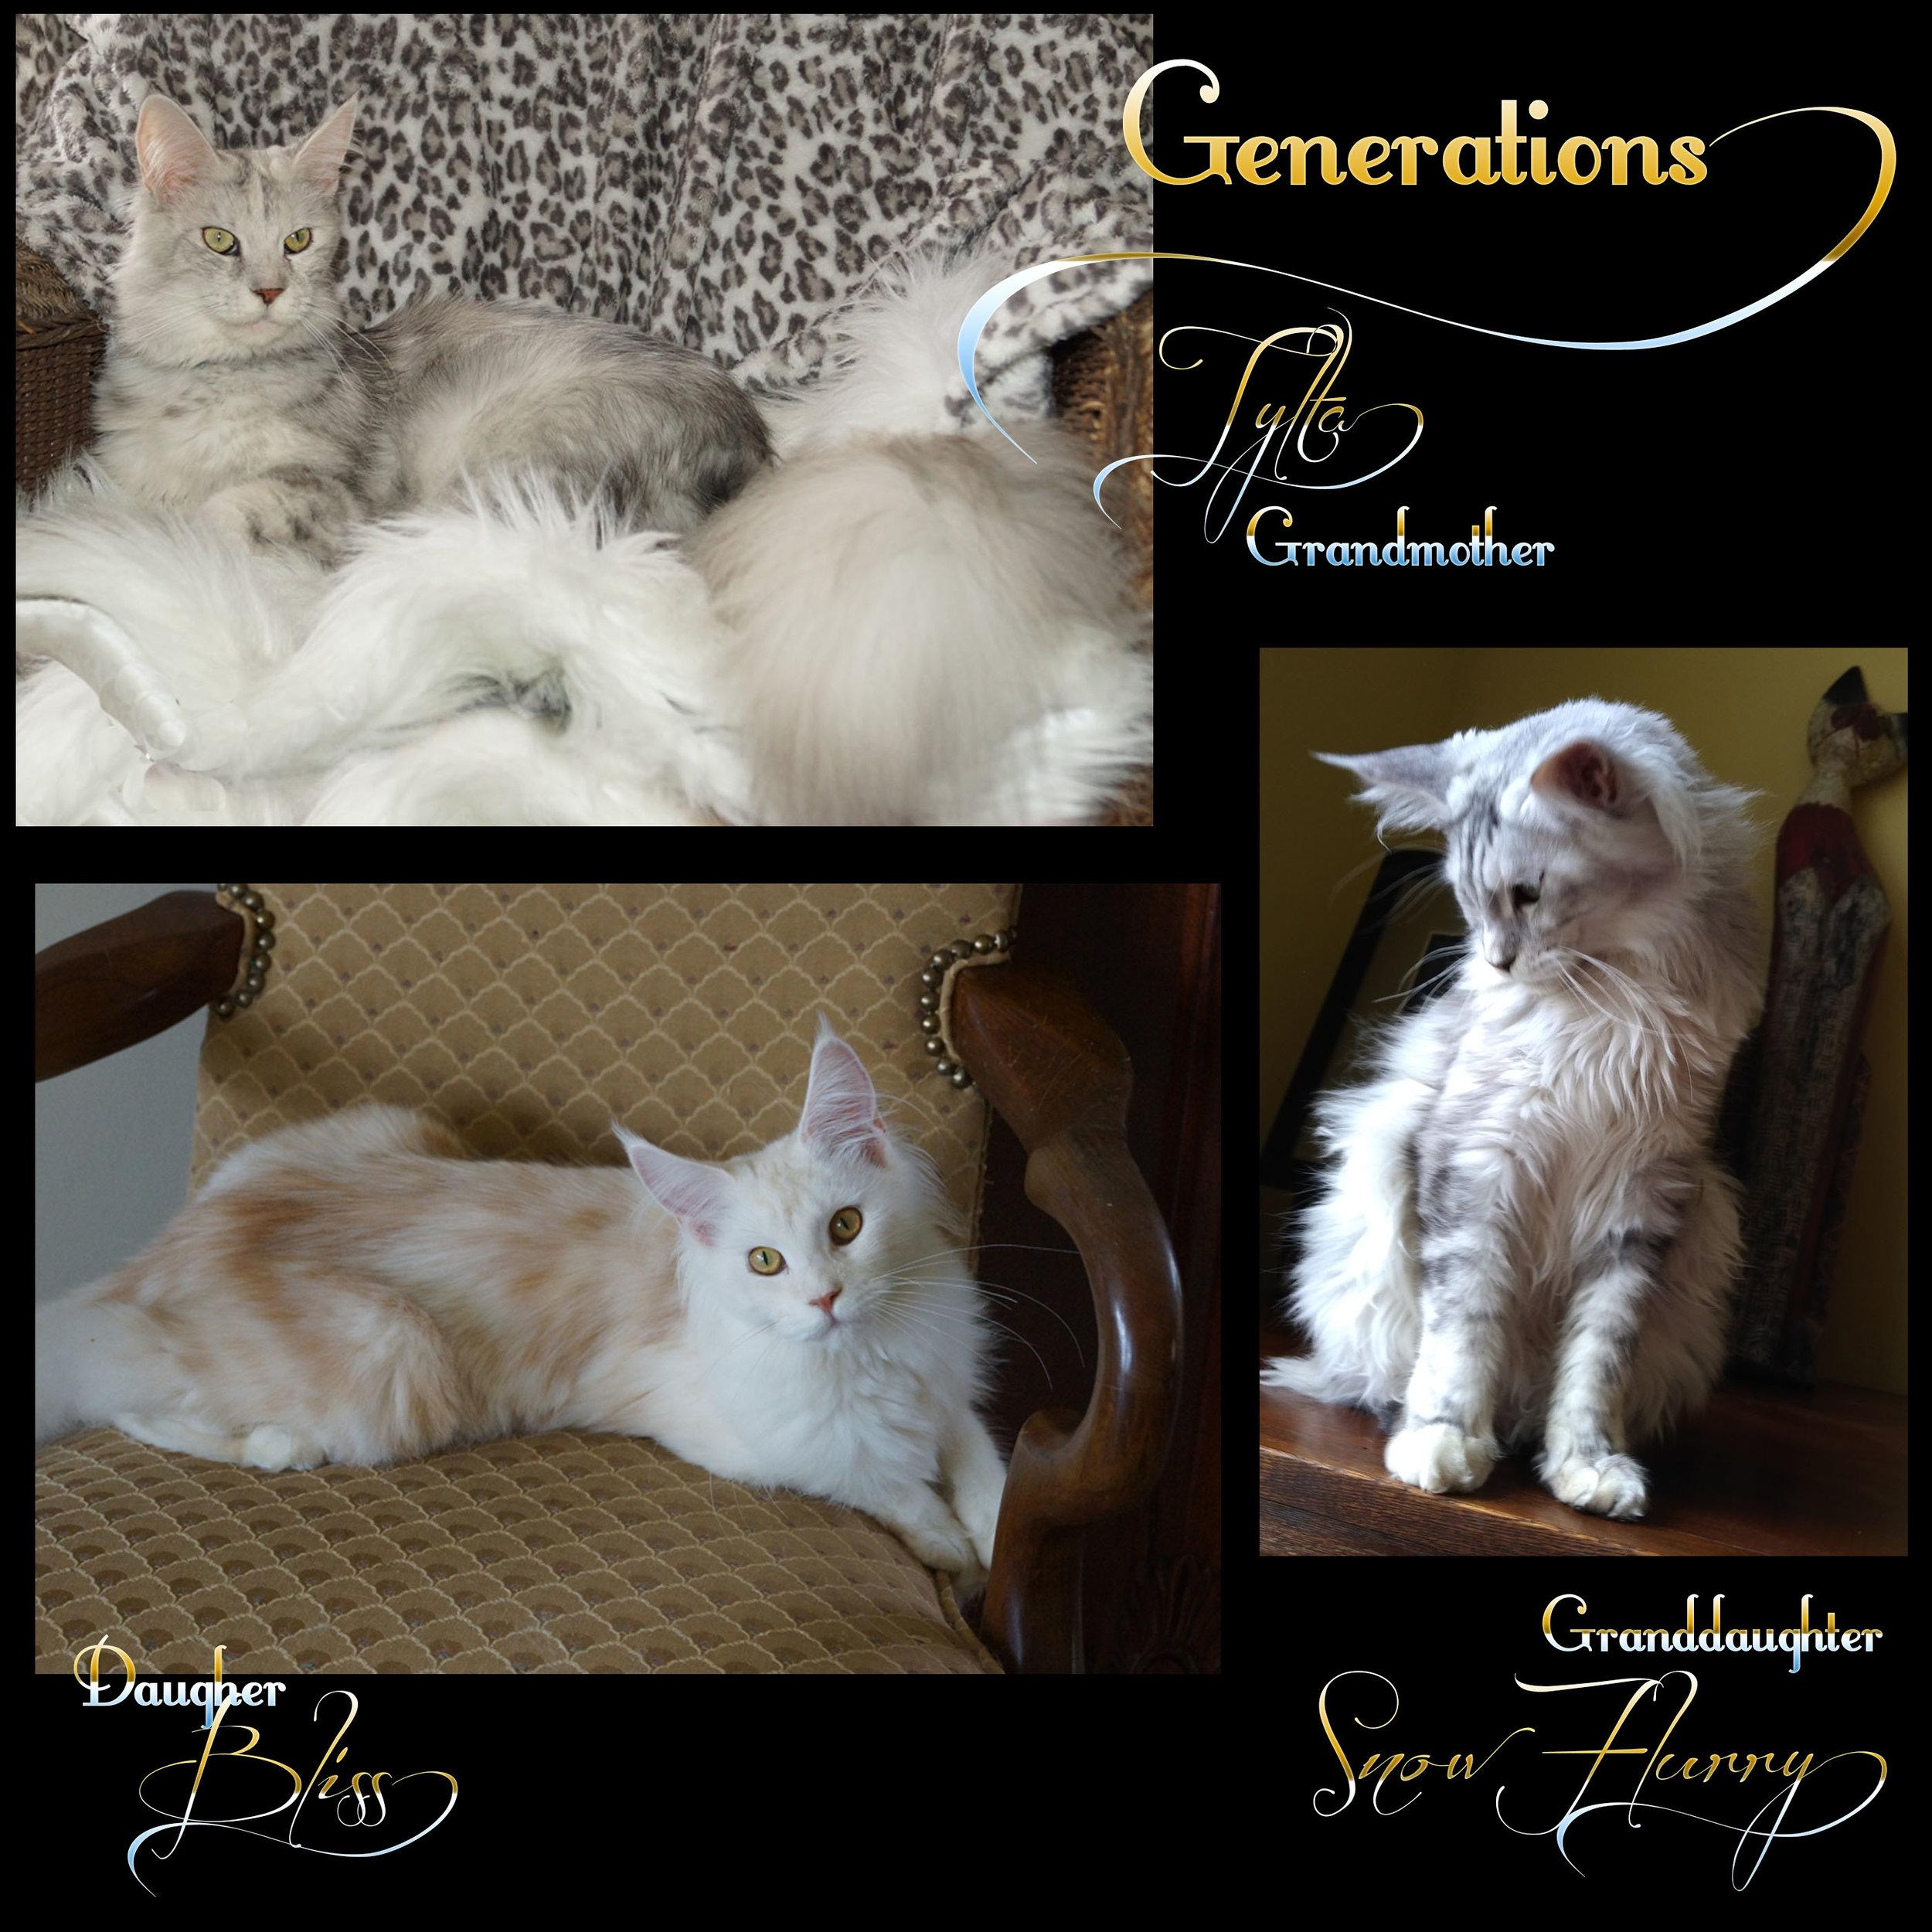 GenerationsTyltaBlissSnowFlurry.jpg